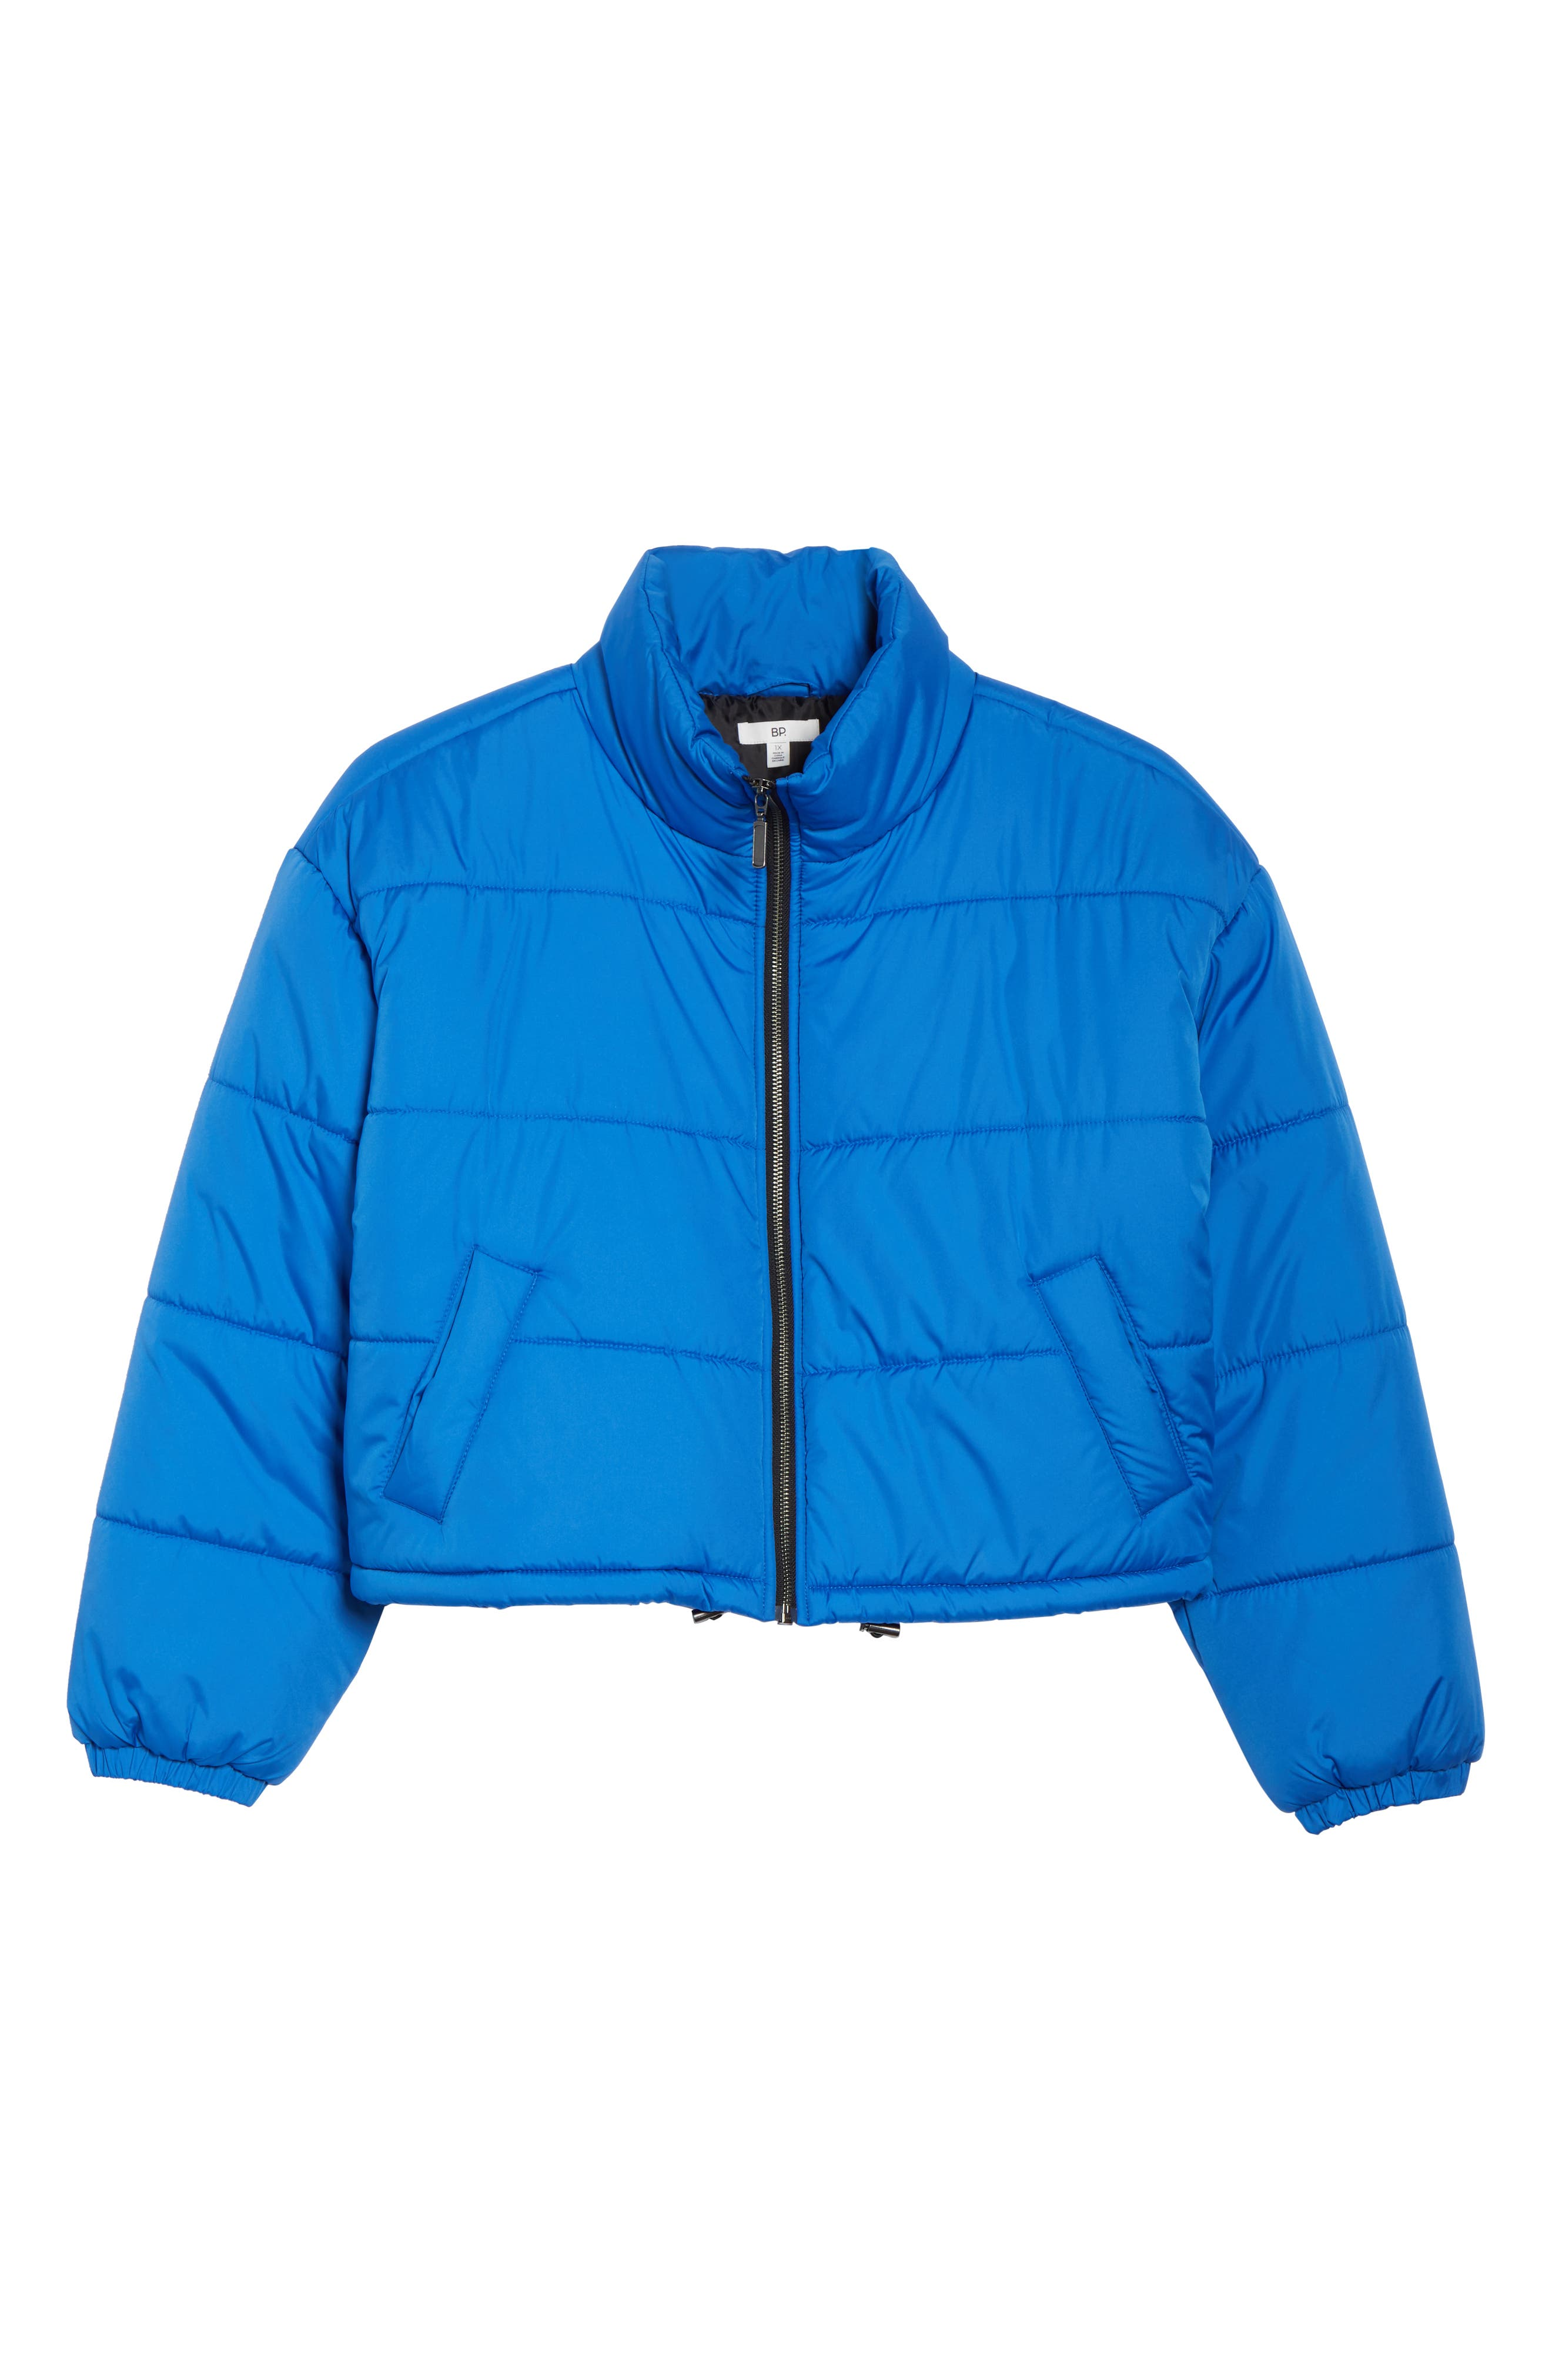 Crop Puffer Jacket,                             Alternate thumbnail 12, color,                             BLUE BOAT